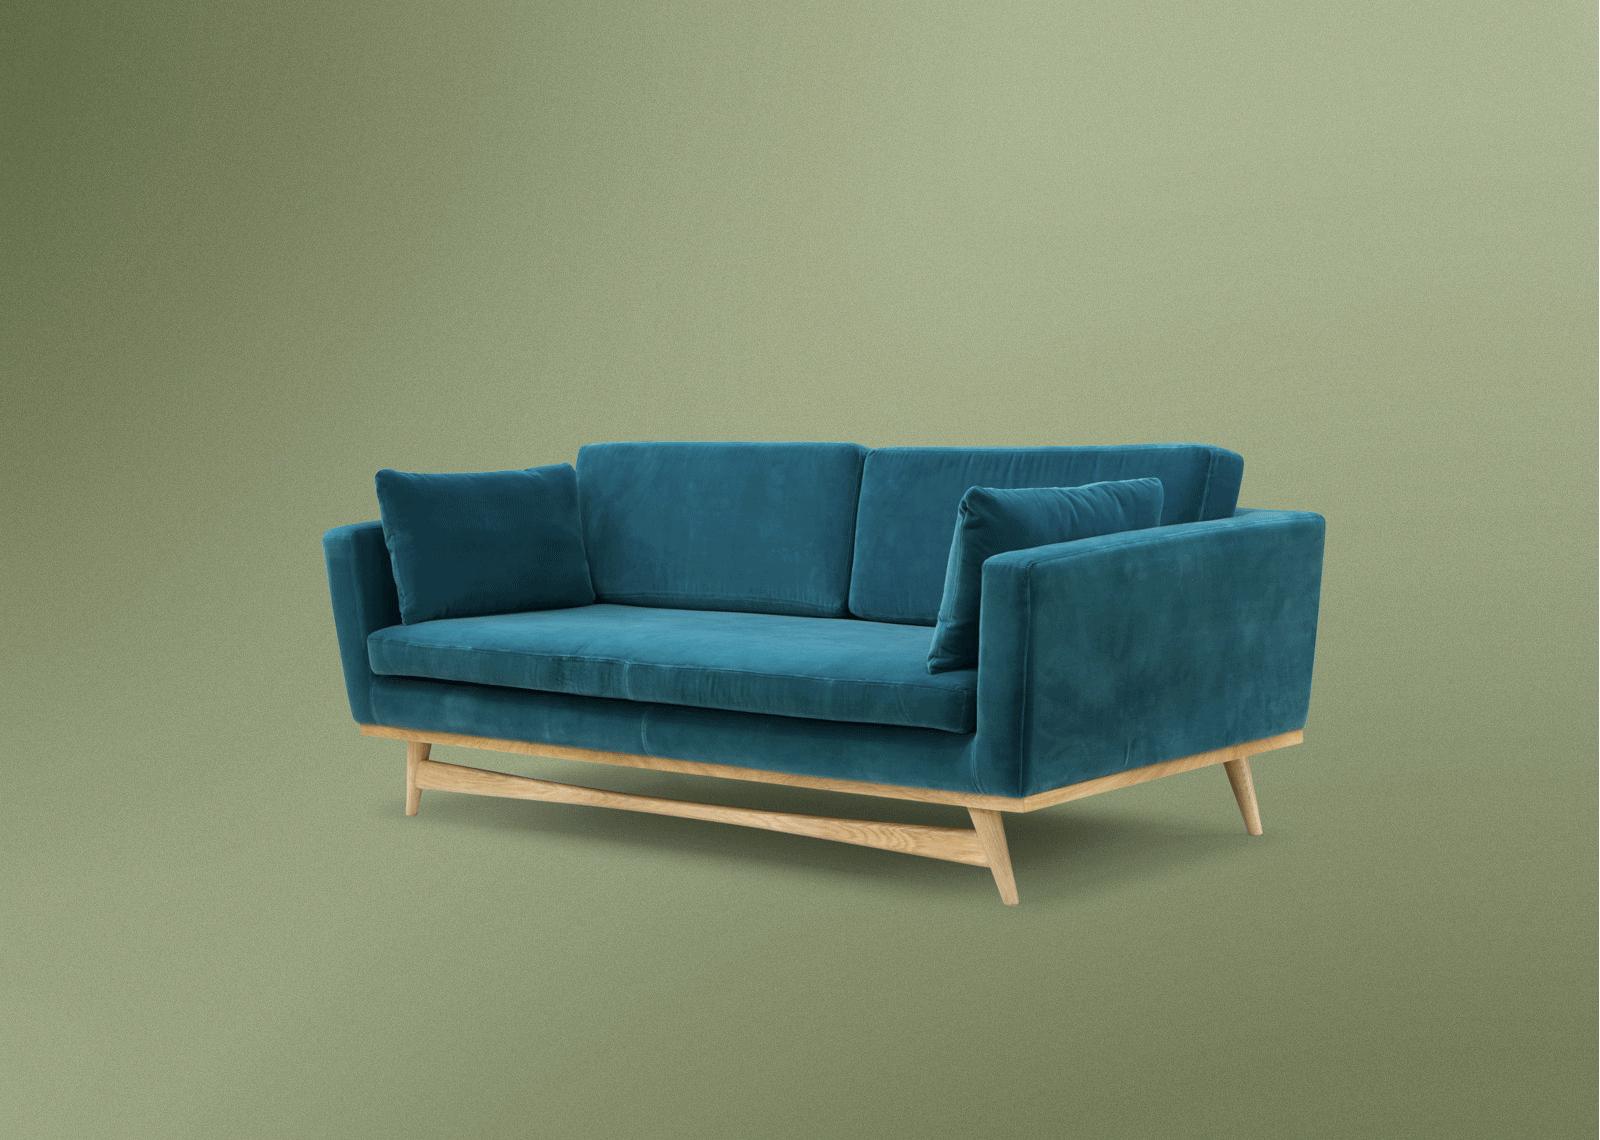 Canapé Design 210cm Velours Bleu Canard